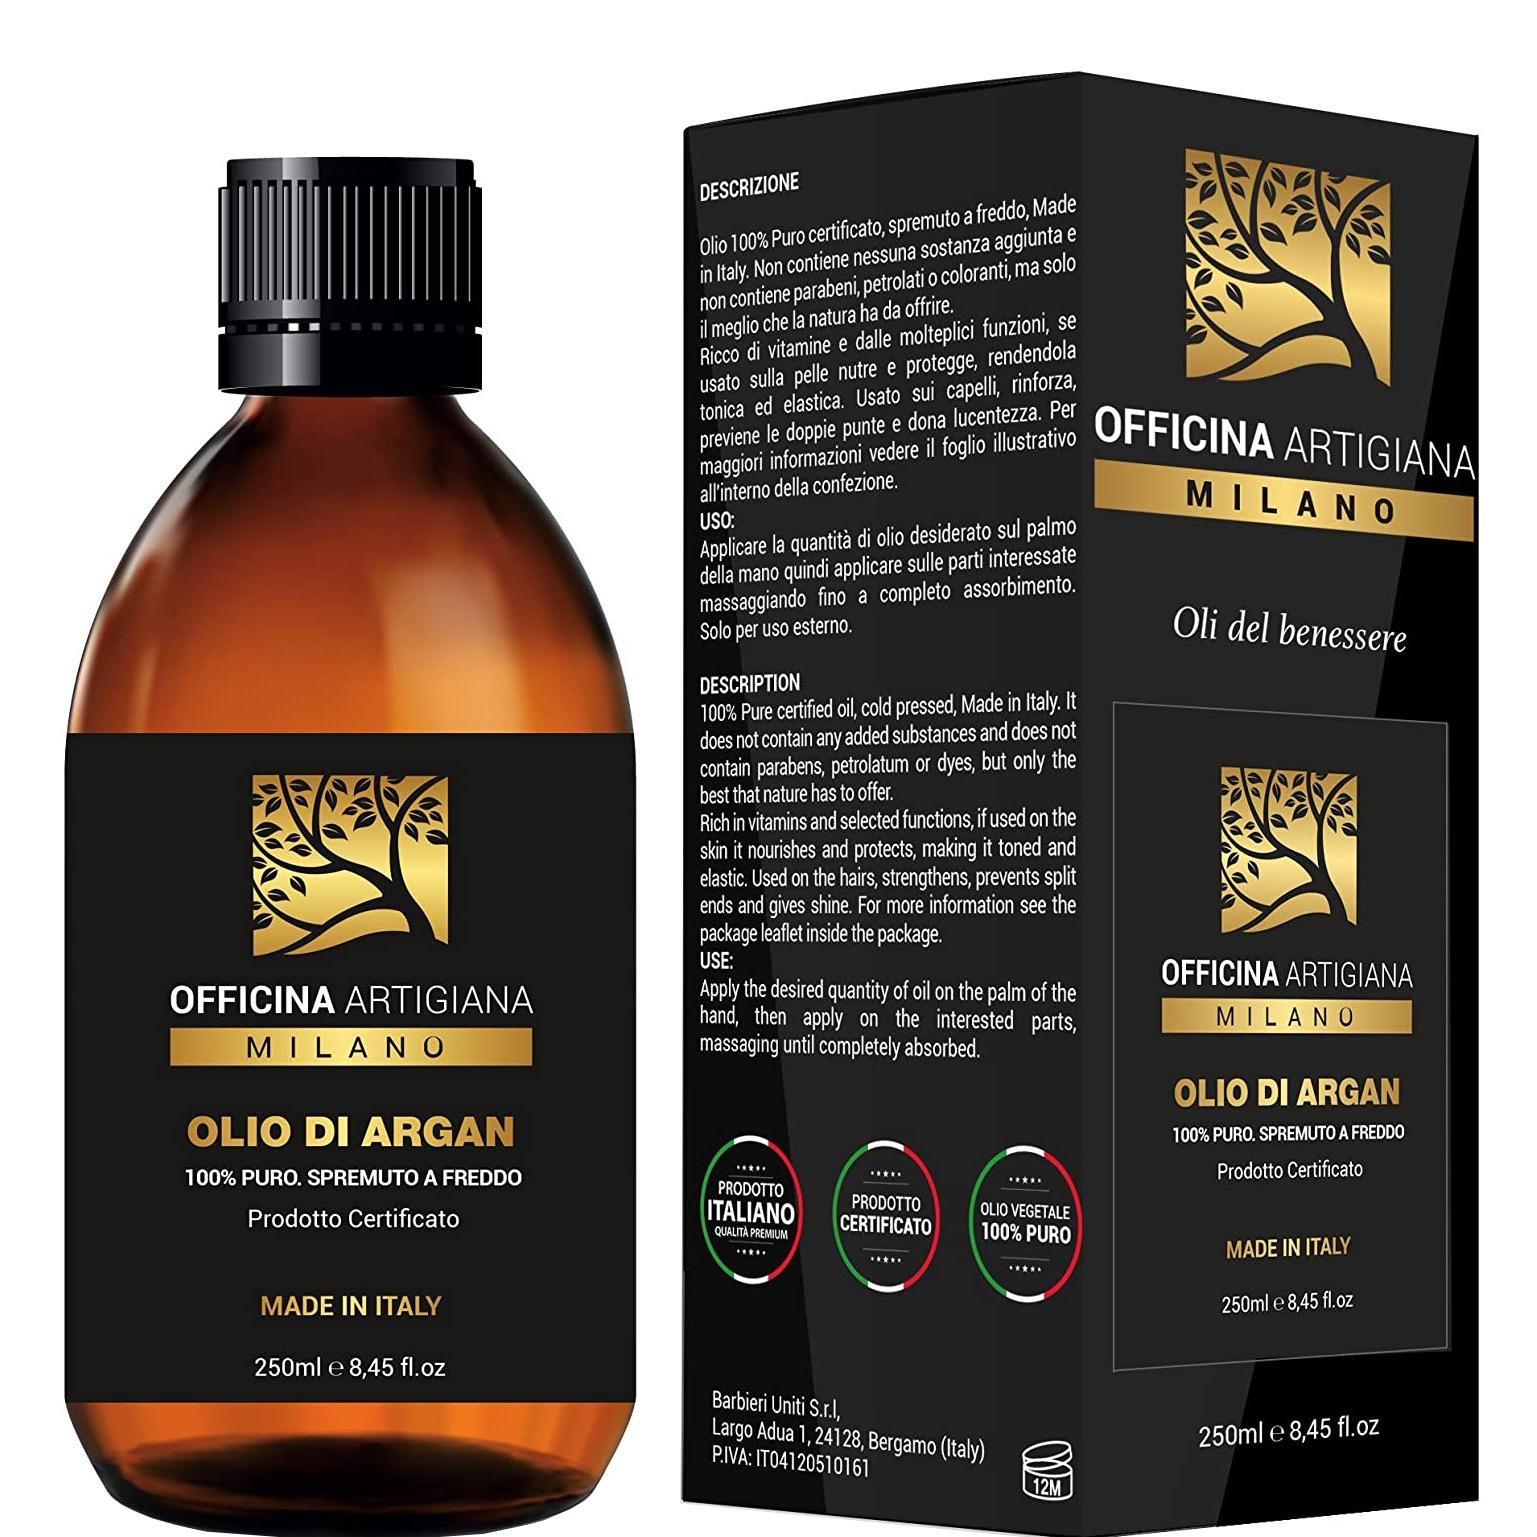 100% Pure Certified Argan Oil